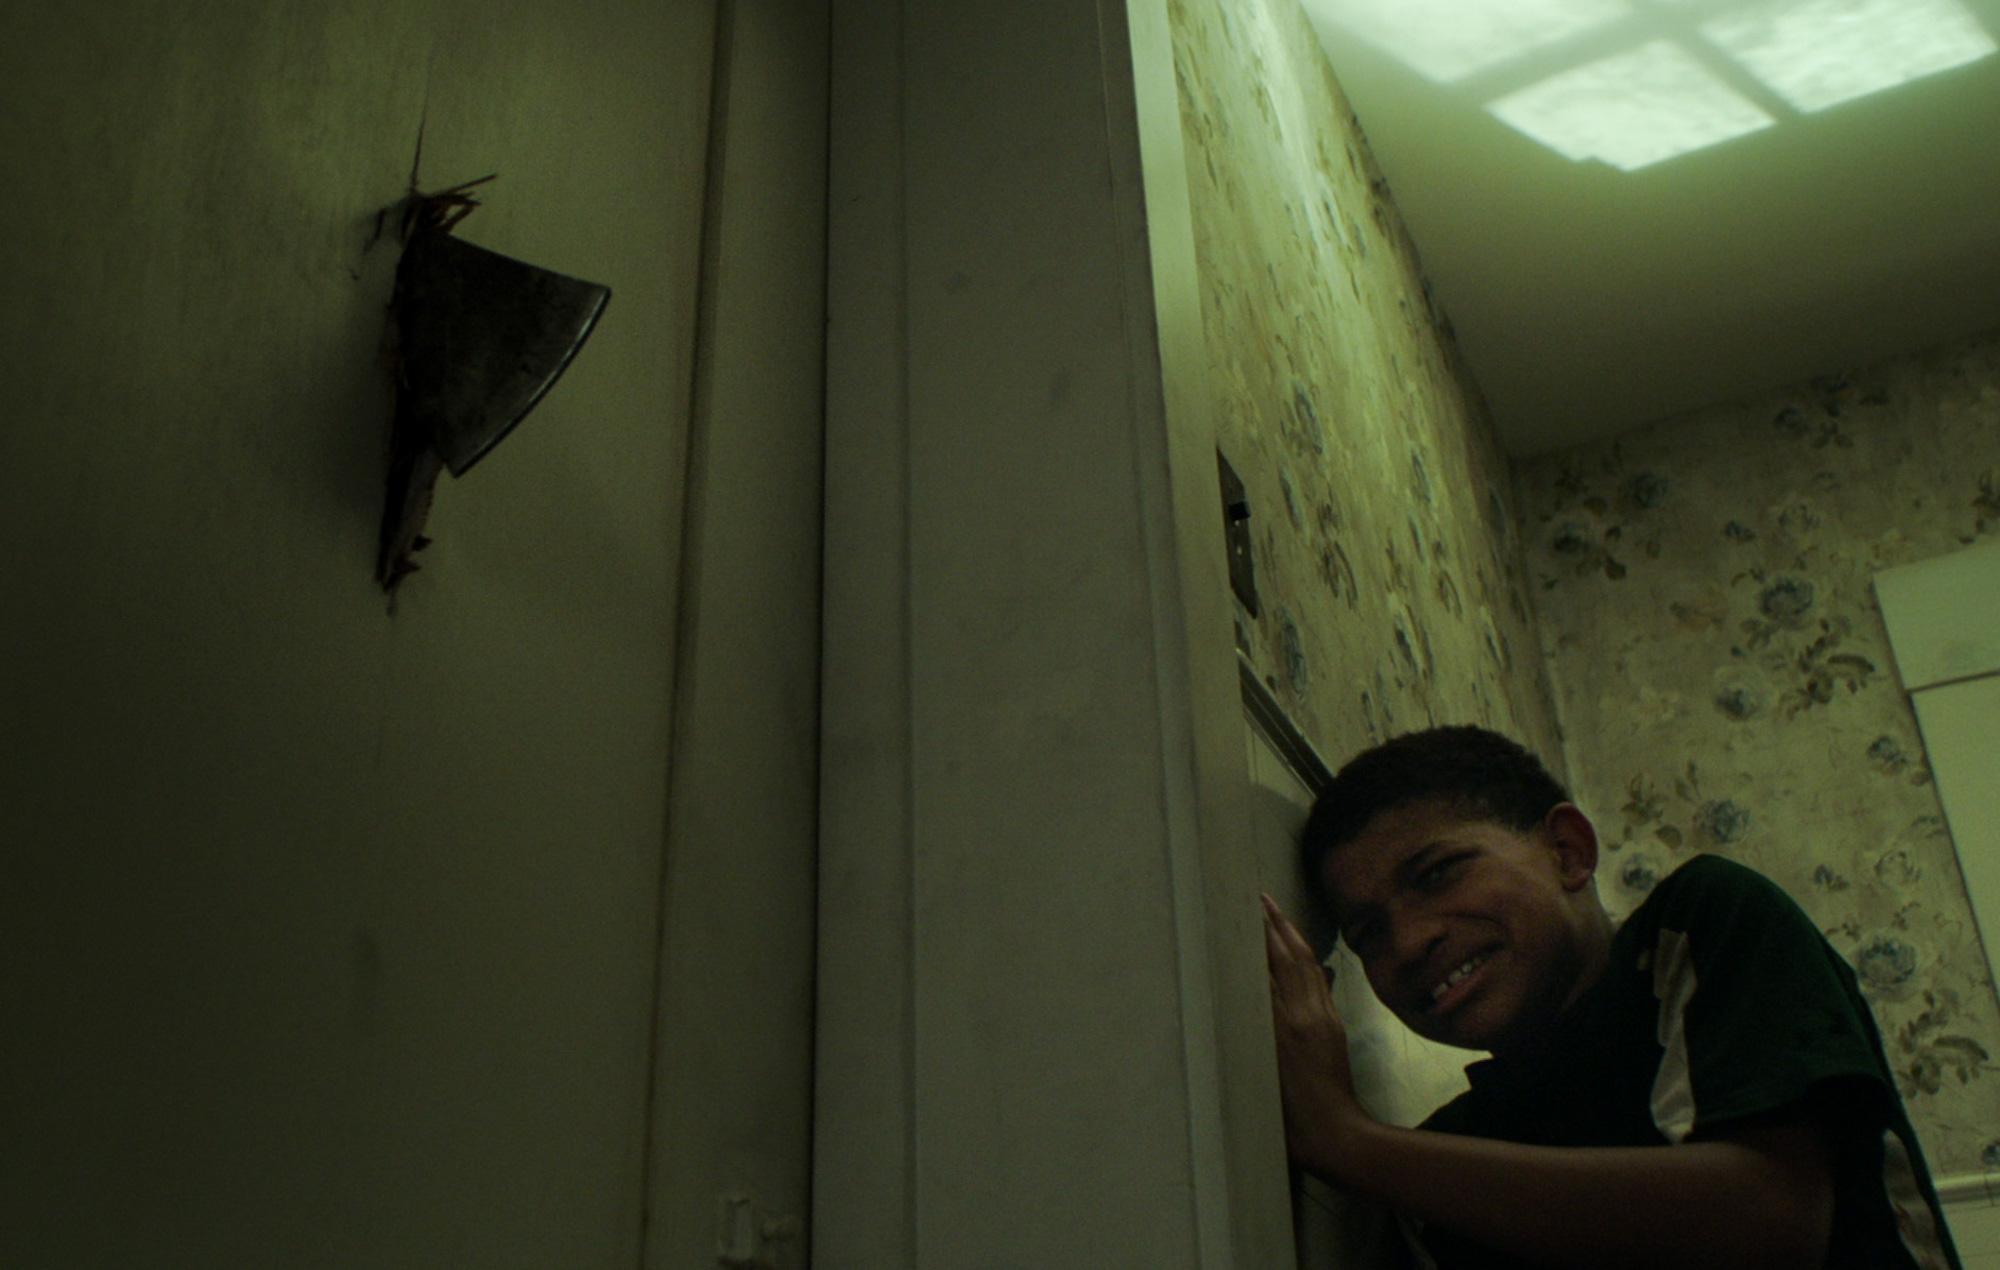 Lonnie Chavis The Boy Behind The Door